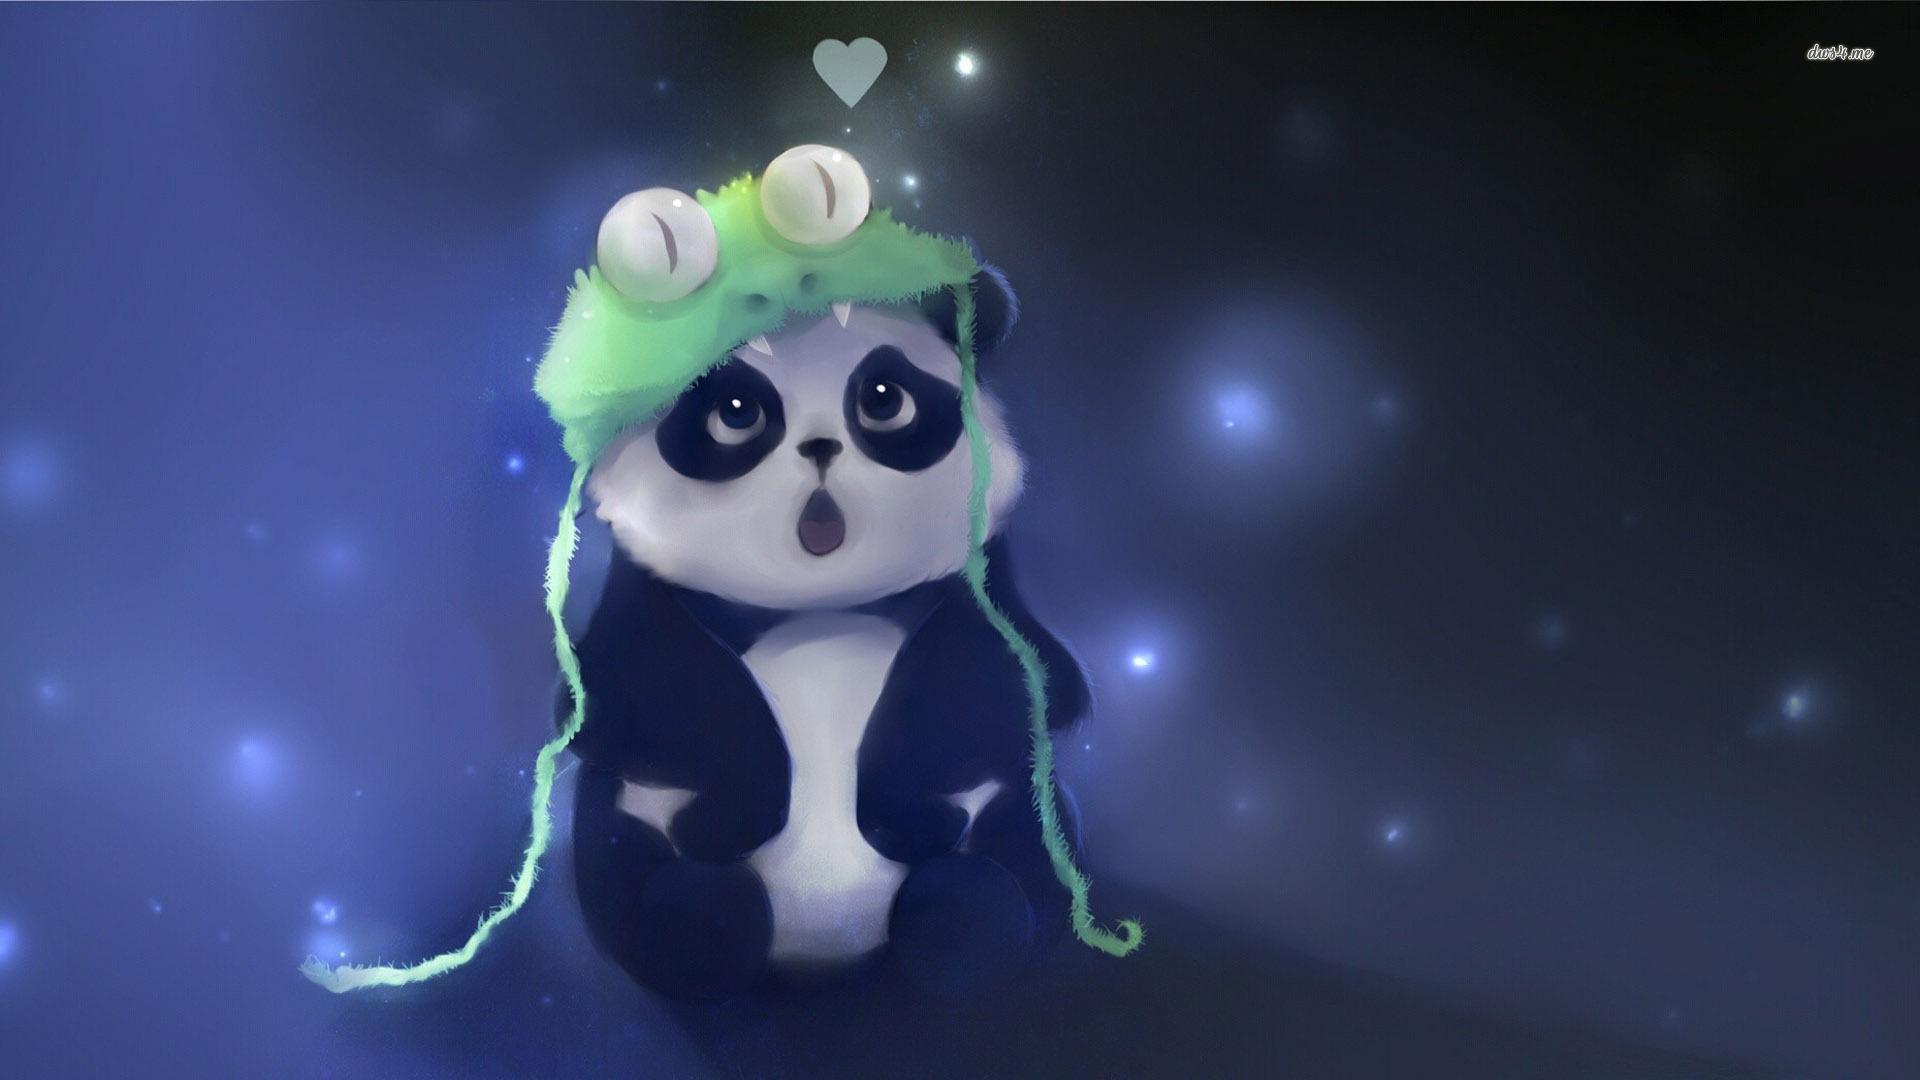 Breathtaking Panda Wallpapers · Astonishing Cute Panda Wallpaper